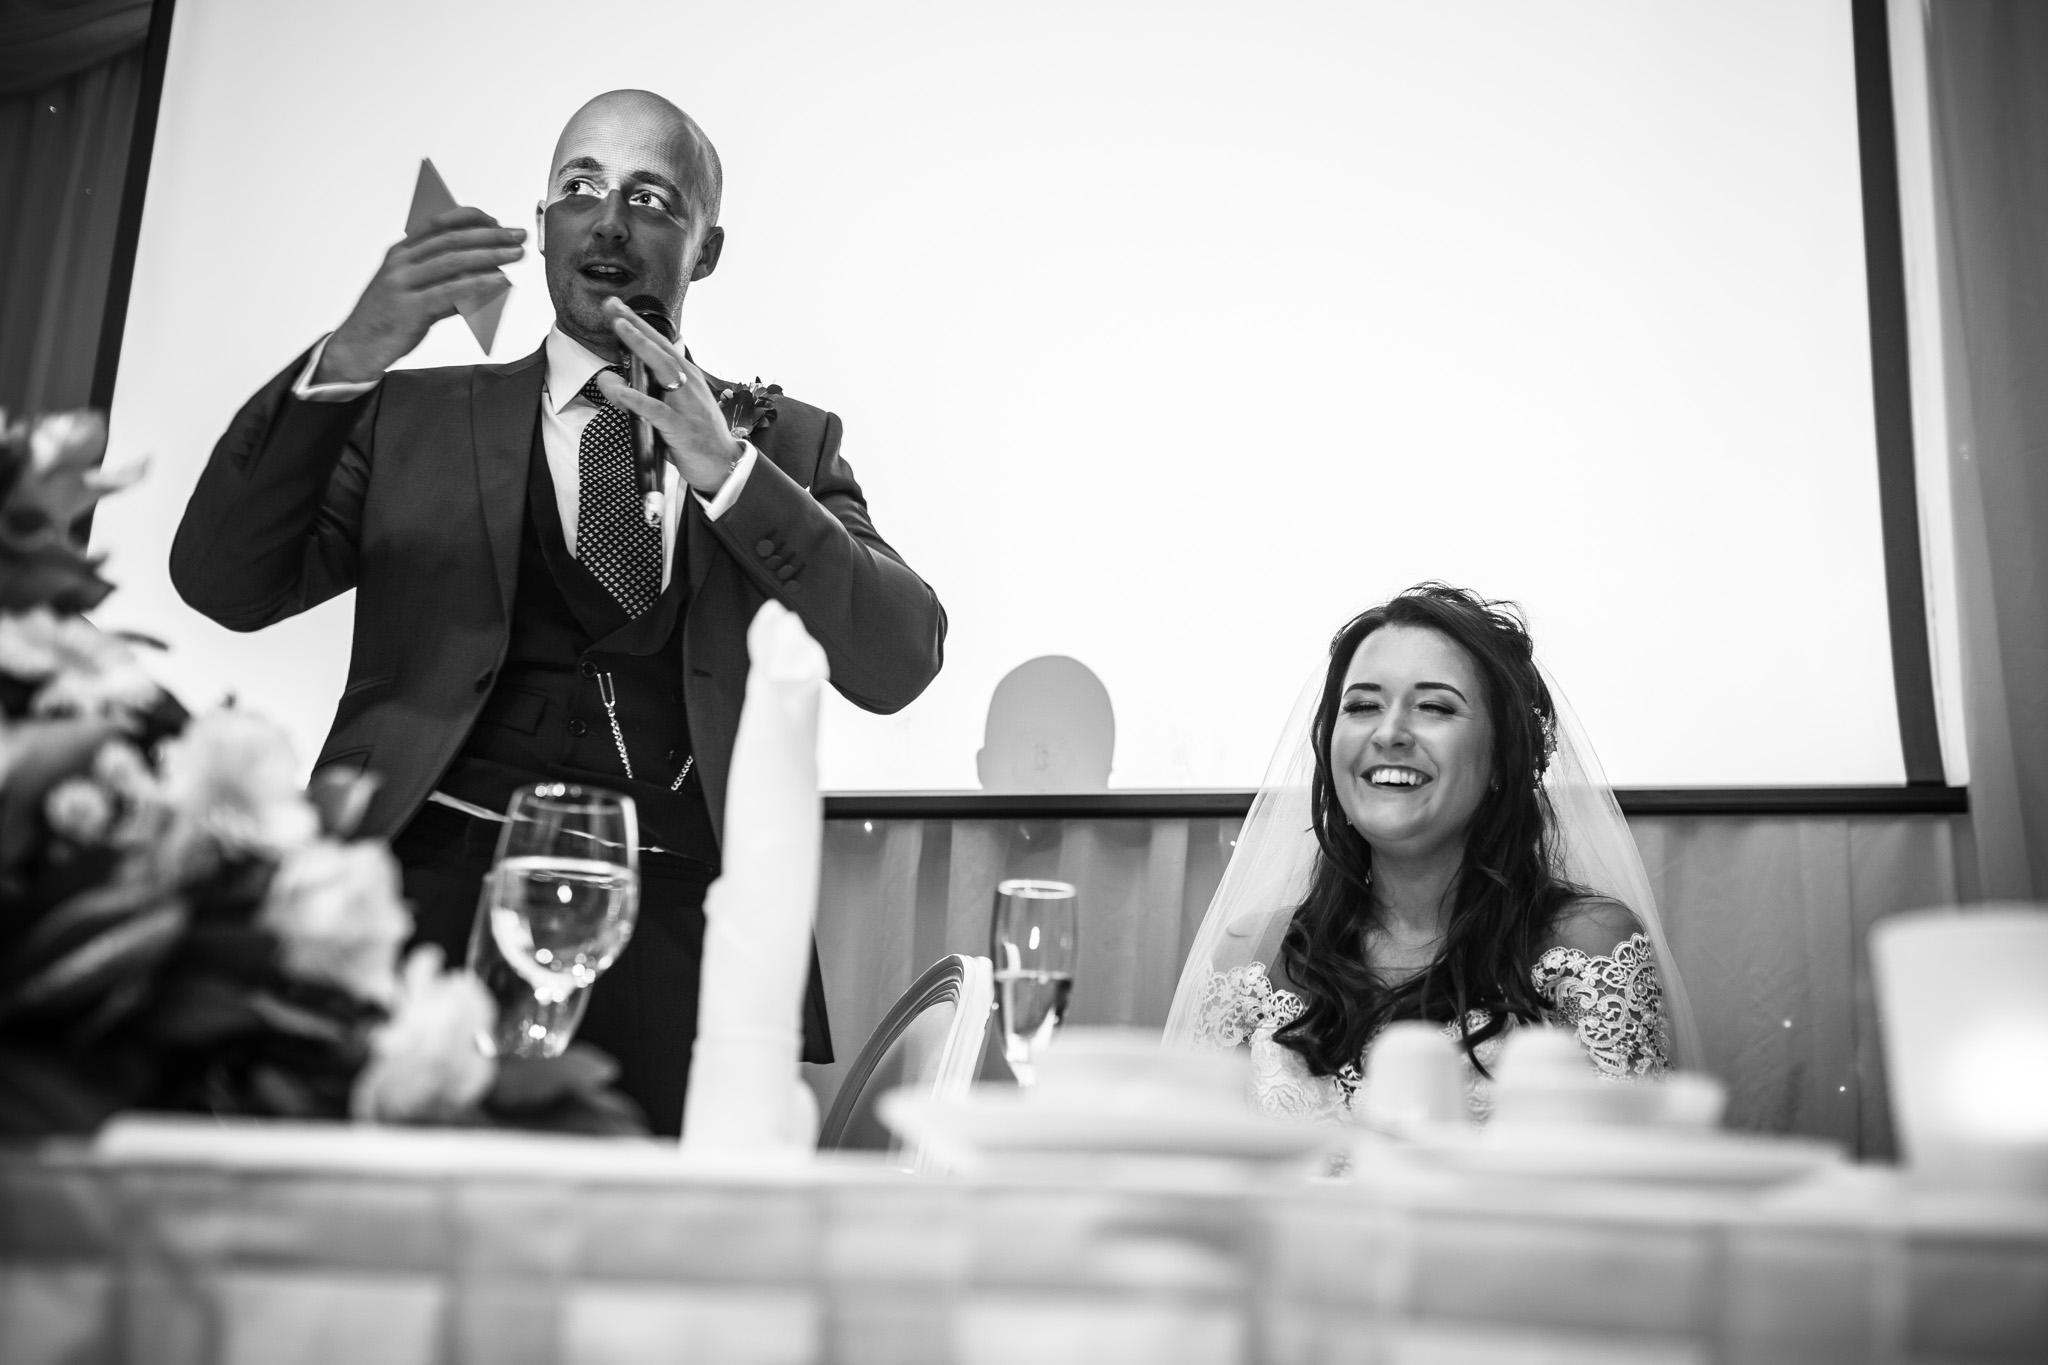 Mark_Barnes_Northern_Ireland_wedding_photographer_Harveys_Point_Donegall_Wedding_photography-Adam&Gemma-52.jpg